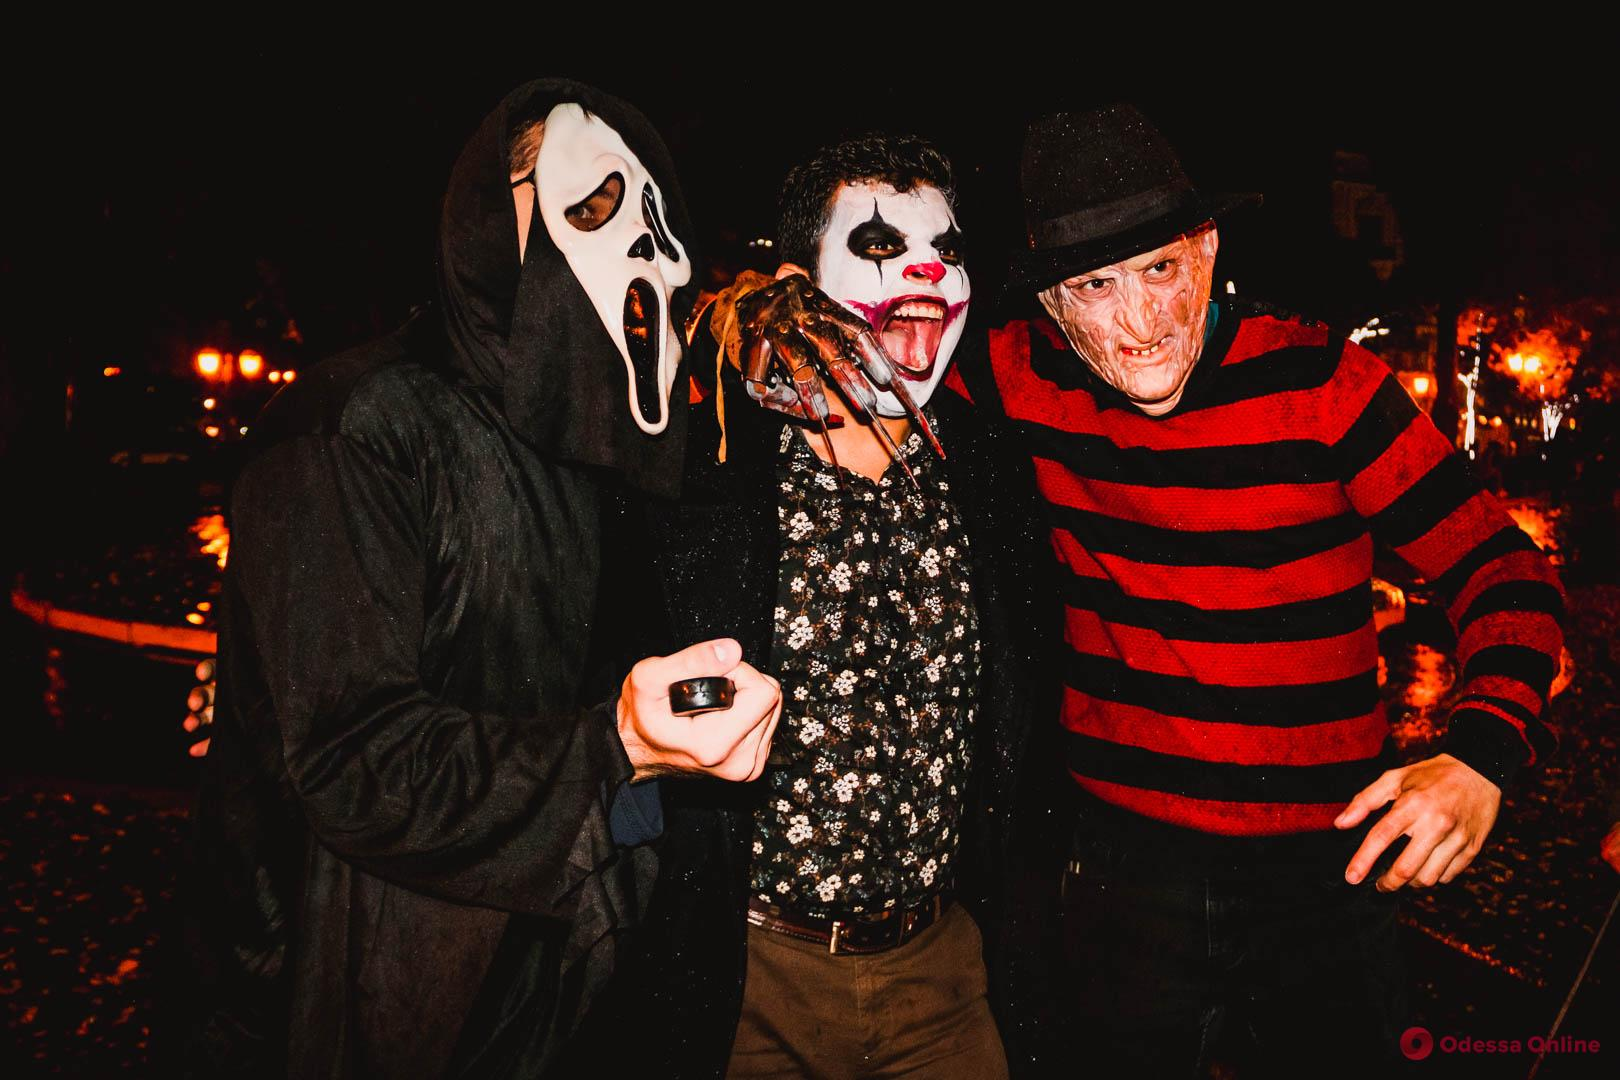 Скелеты, привидения и Фредди Крюгер: Одесса ярко празднует Хэллоуин (фоторепортаж)